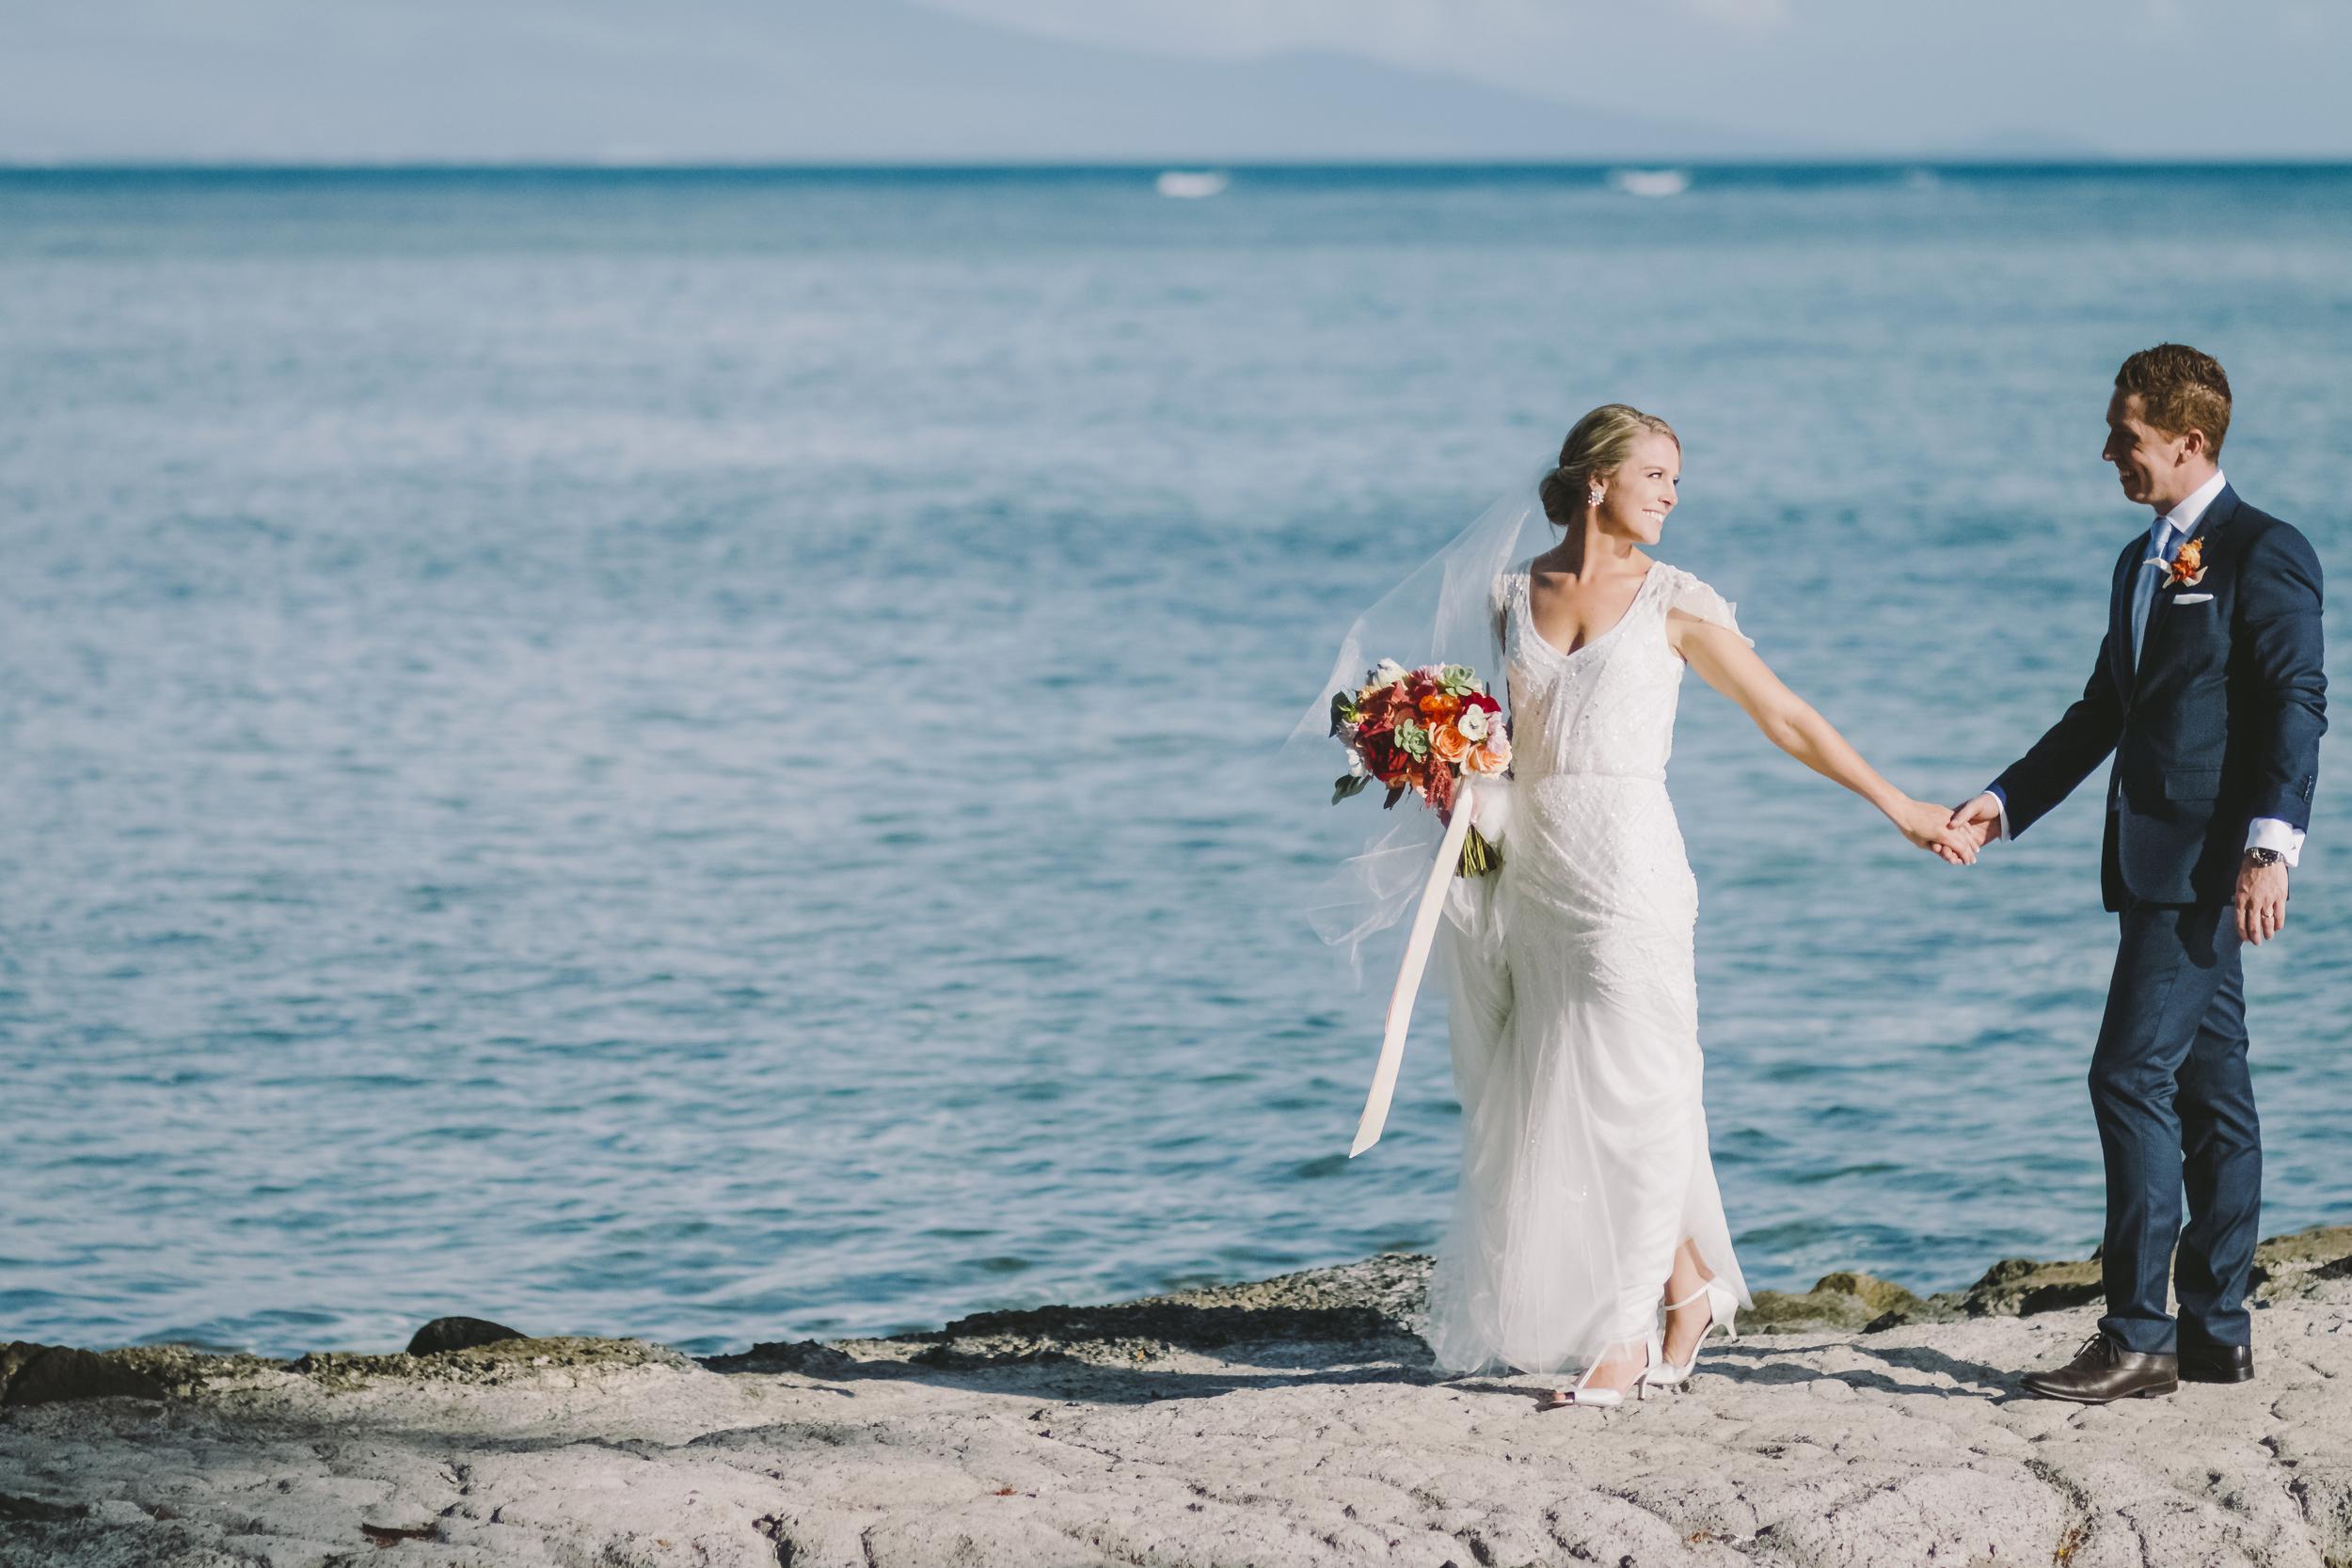 angie-diaz-photography-maui-wedding-mel-matt- 72c.jpg